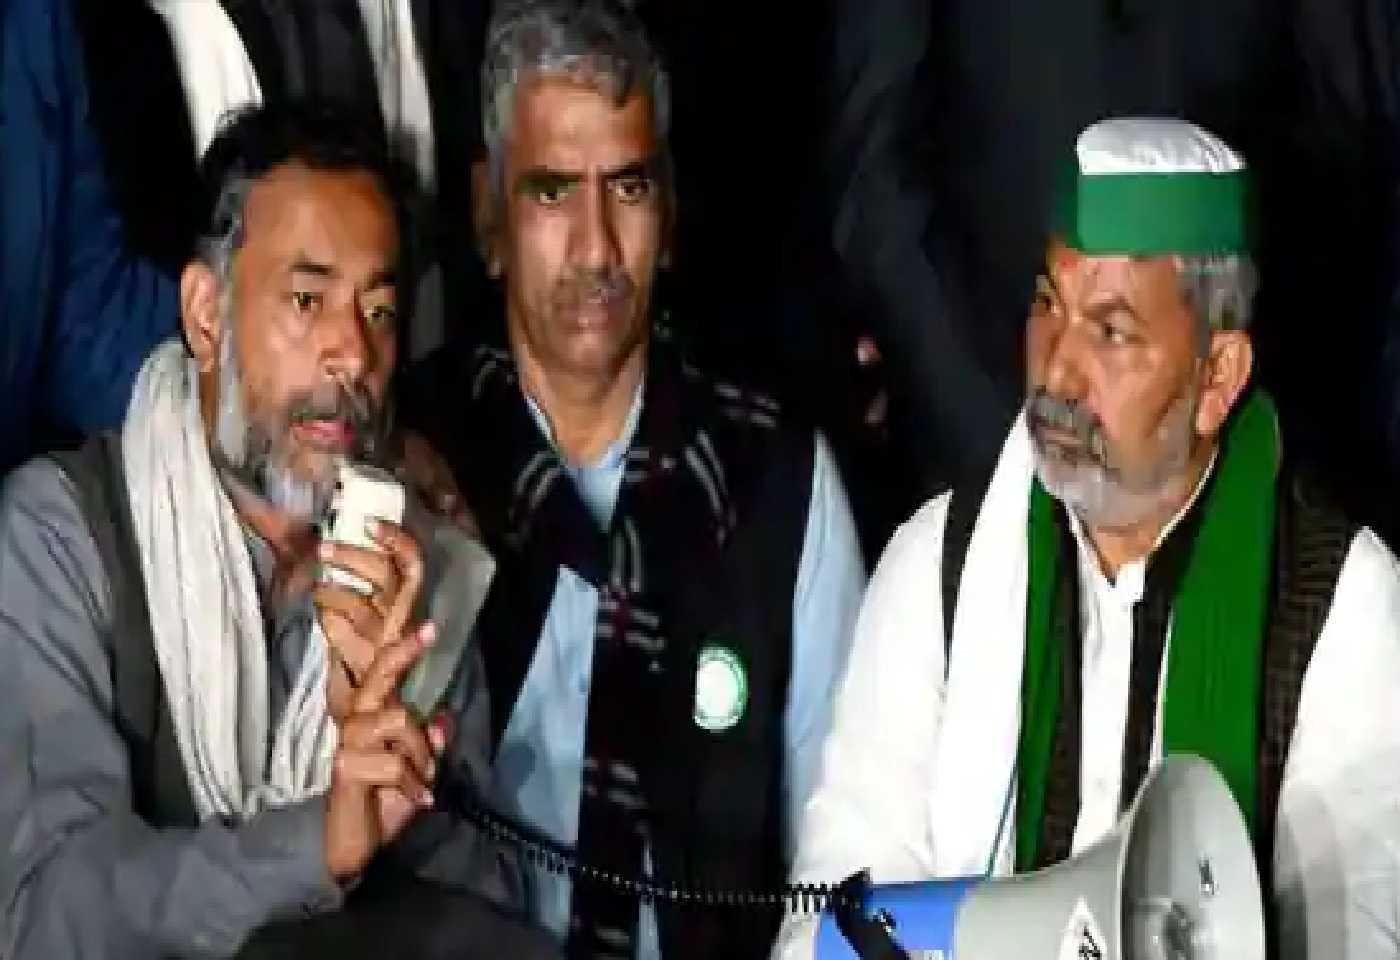 Lakhimpur Kheri Violence Sanyukt Kisan Morcha Will Burn Statue of PM Modi And Amit Shah on Dashehara, Calls Rail Roko On Oct 18 and 26 oct Mahapanchayat